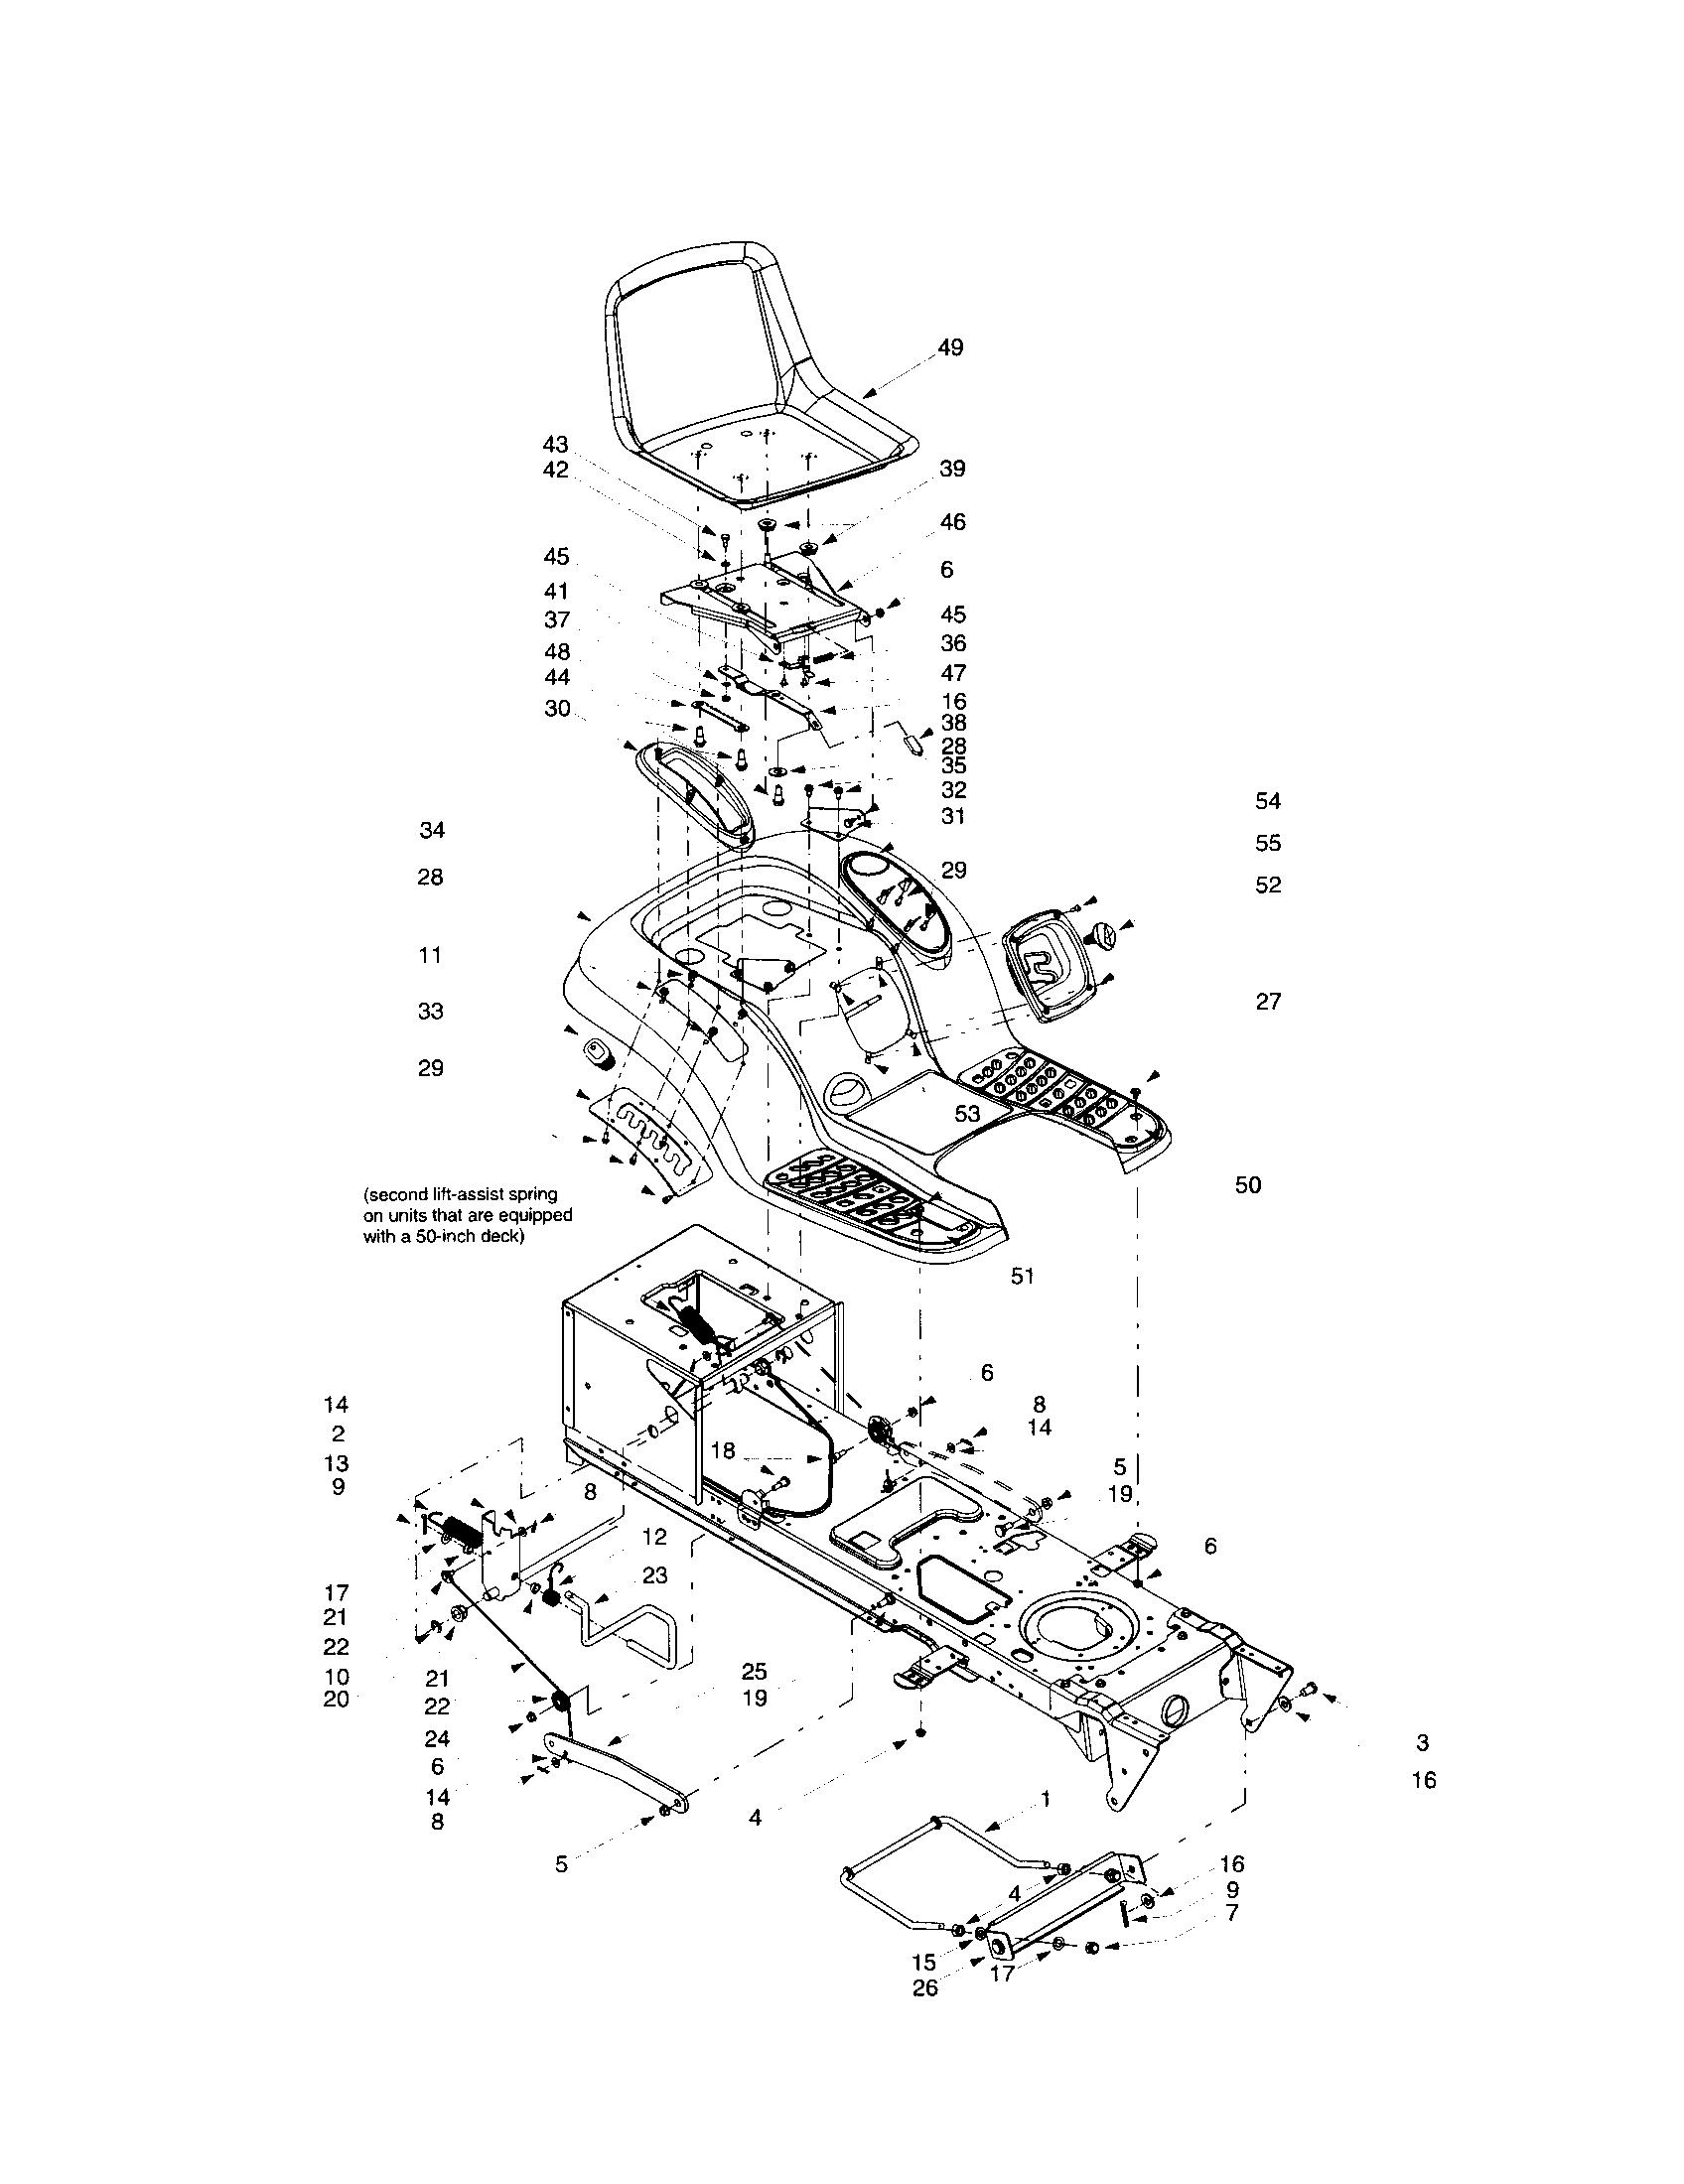 Troybilt model 14BV809H063 lawn, tractor genuine parts